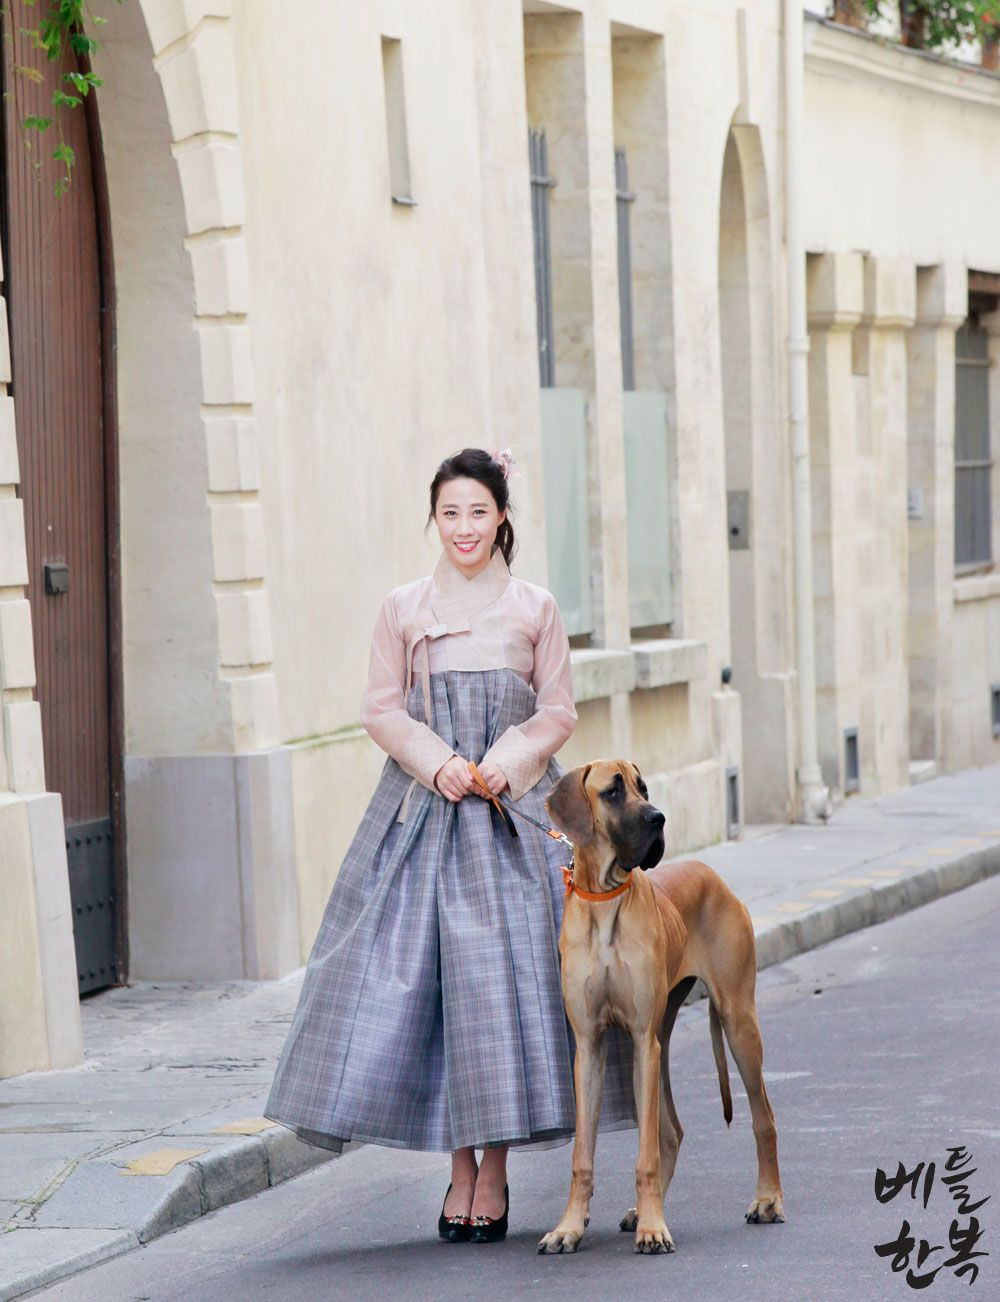 Korean traditional clothes.(한복스냅) #snap #hanbok #dress #유럽여행 #한복입고유럽 #여행 #trip #전통의상 #한복맞춤 #스타일링 #생활한복 #korean #style #pattern #travel #picture #natural #dog